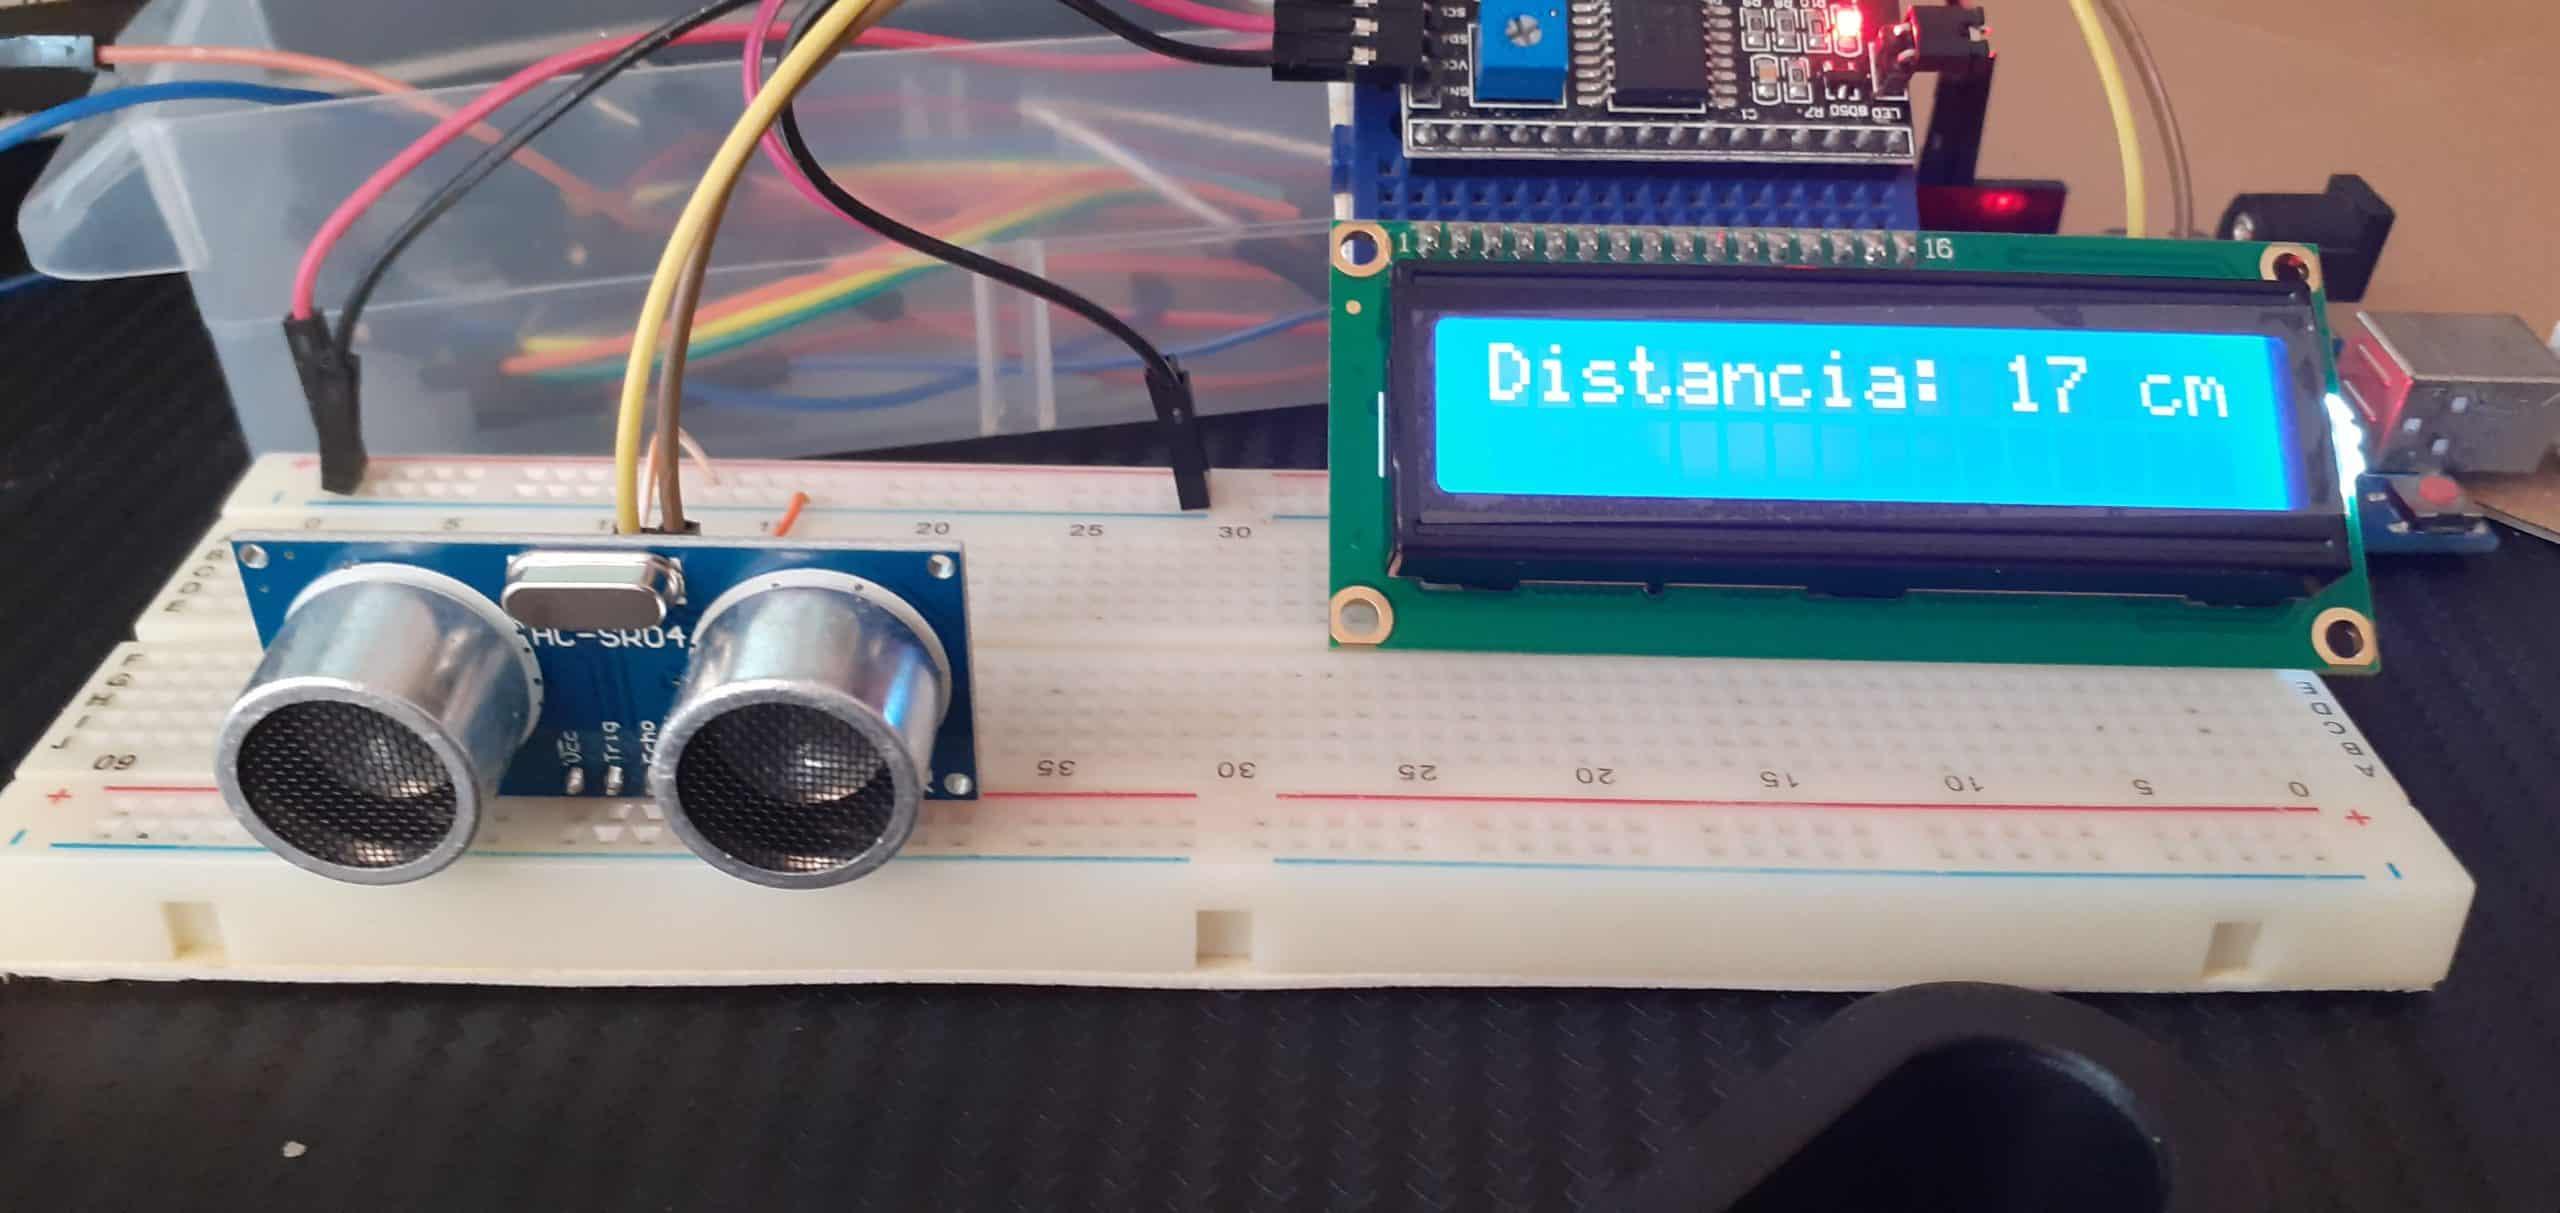 Proyecto Arduino, HC-SR04 y Pantalla LCD